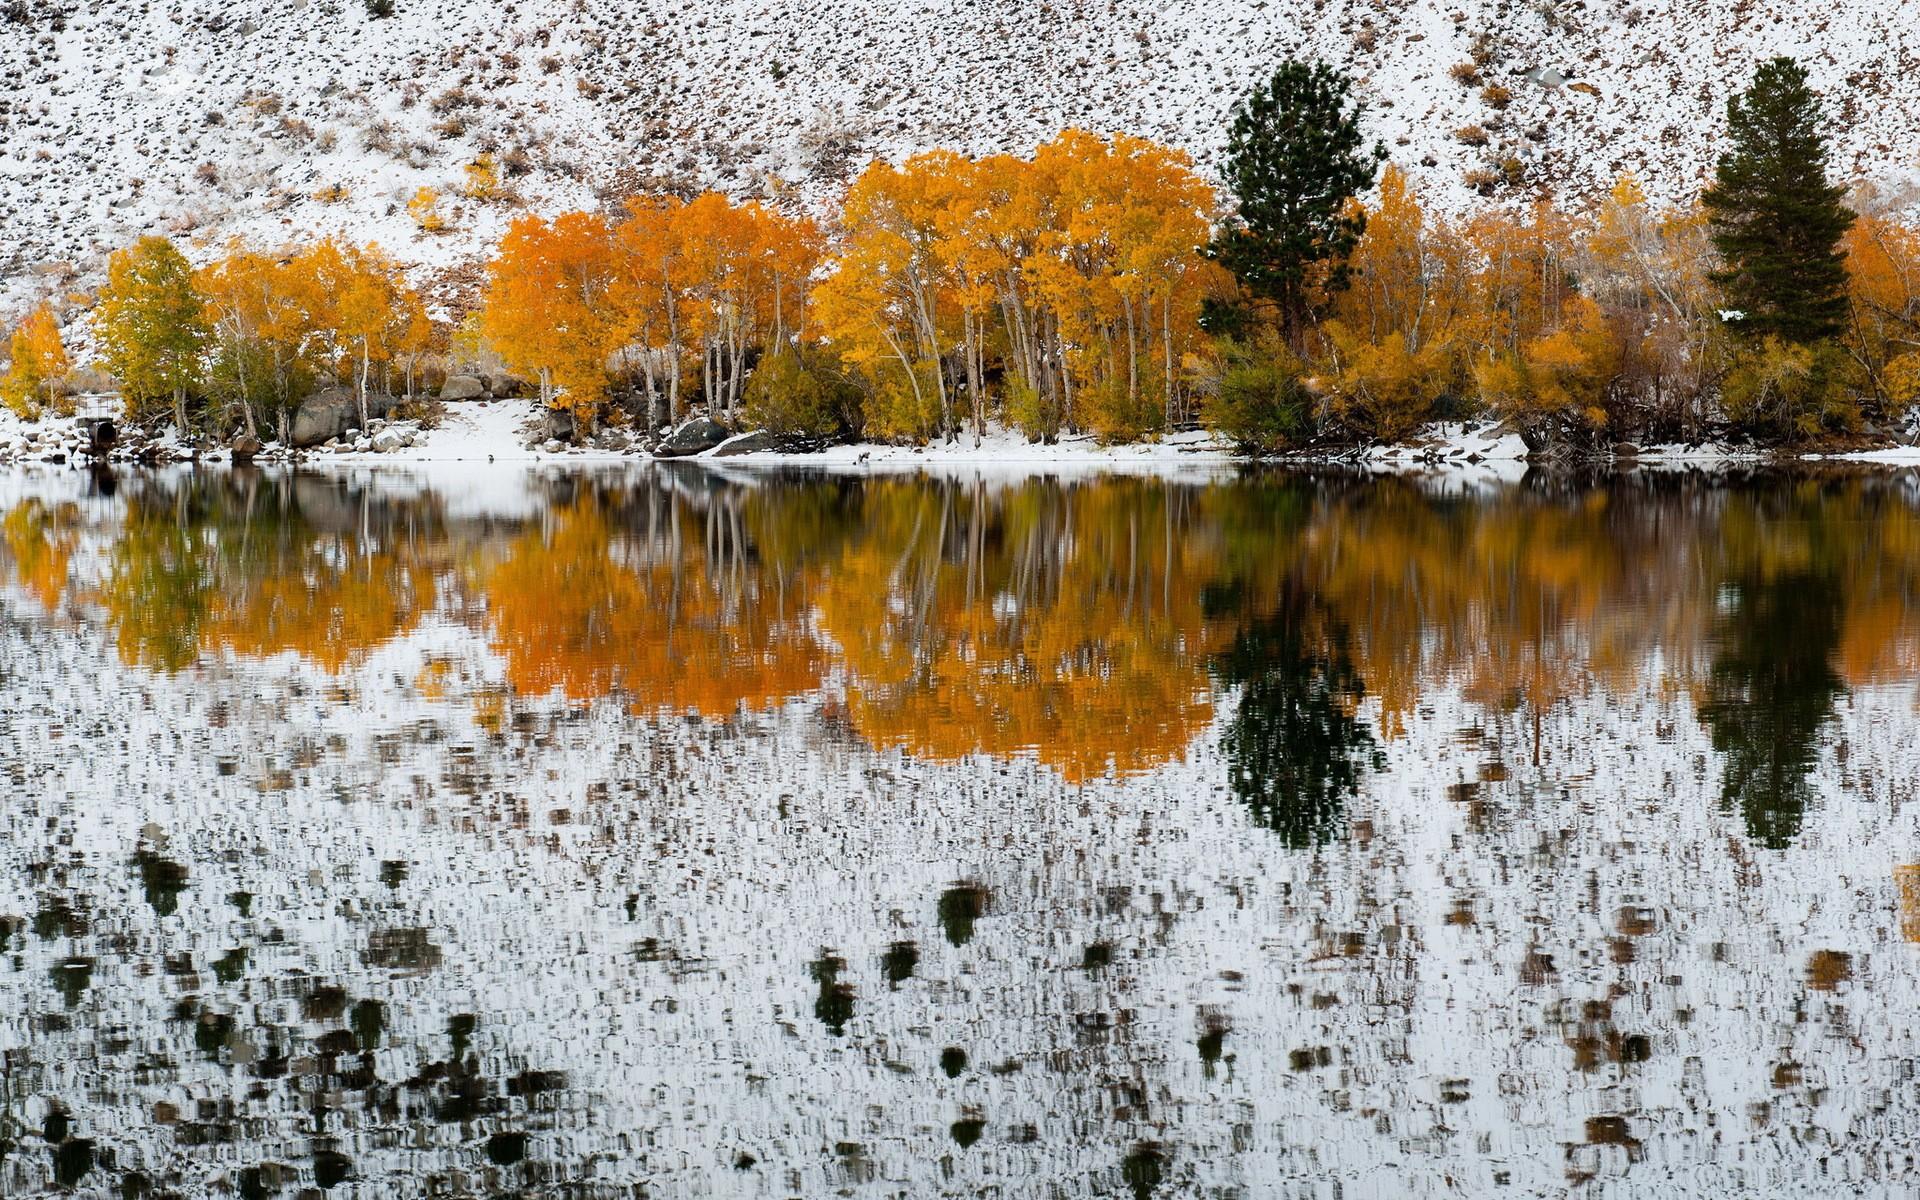 wallpaper landscape winter autumn - photo #48